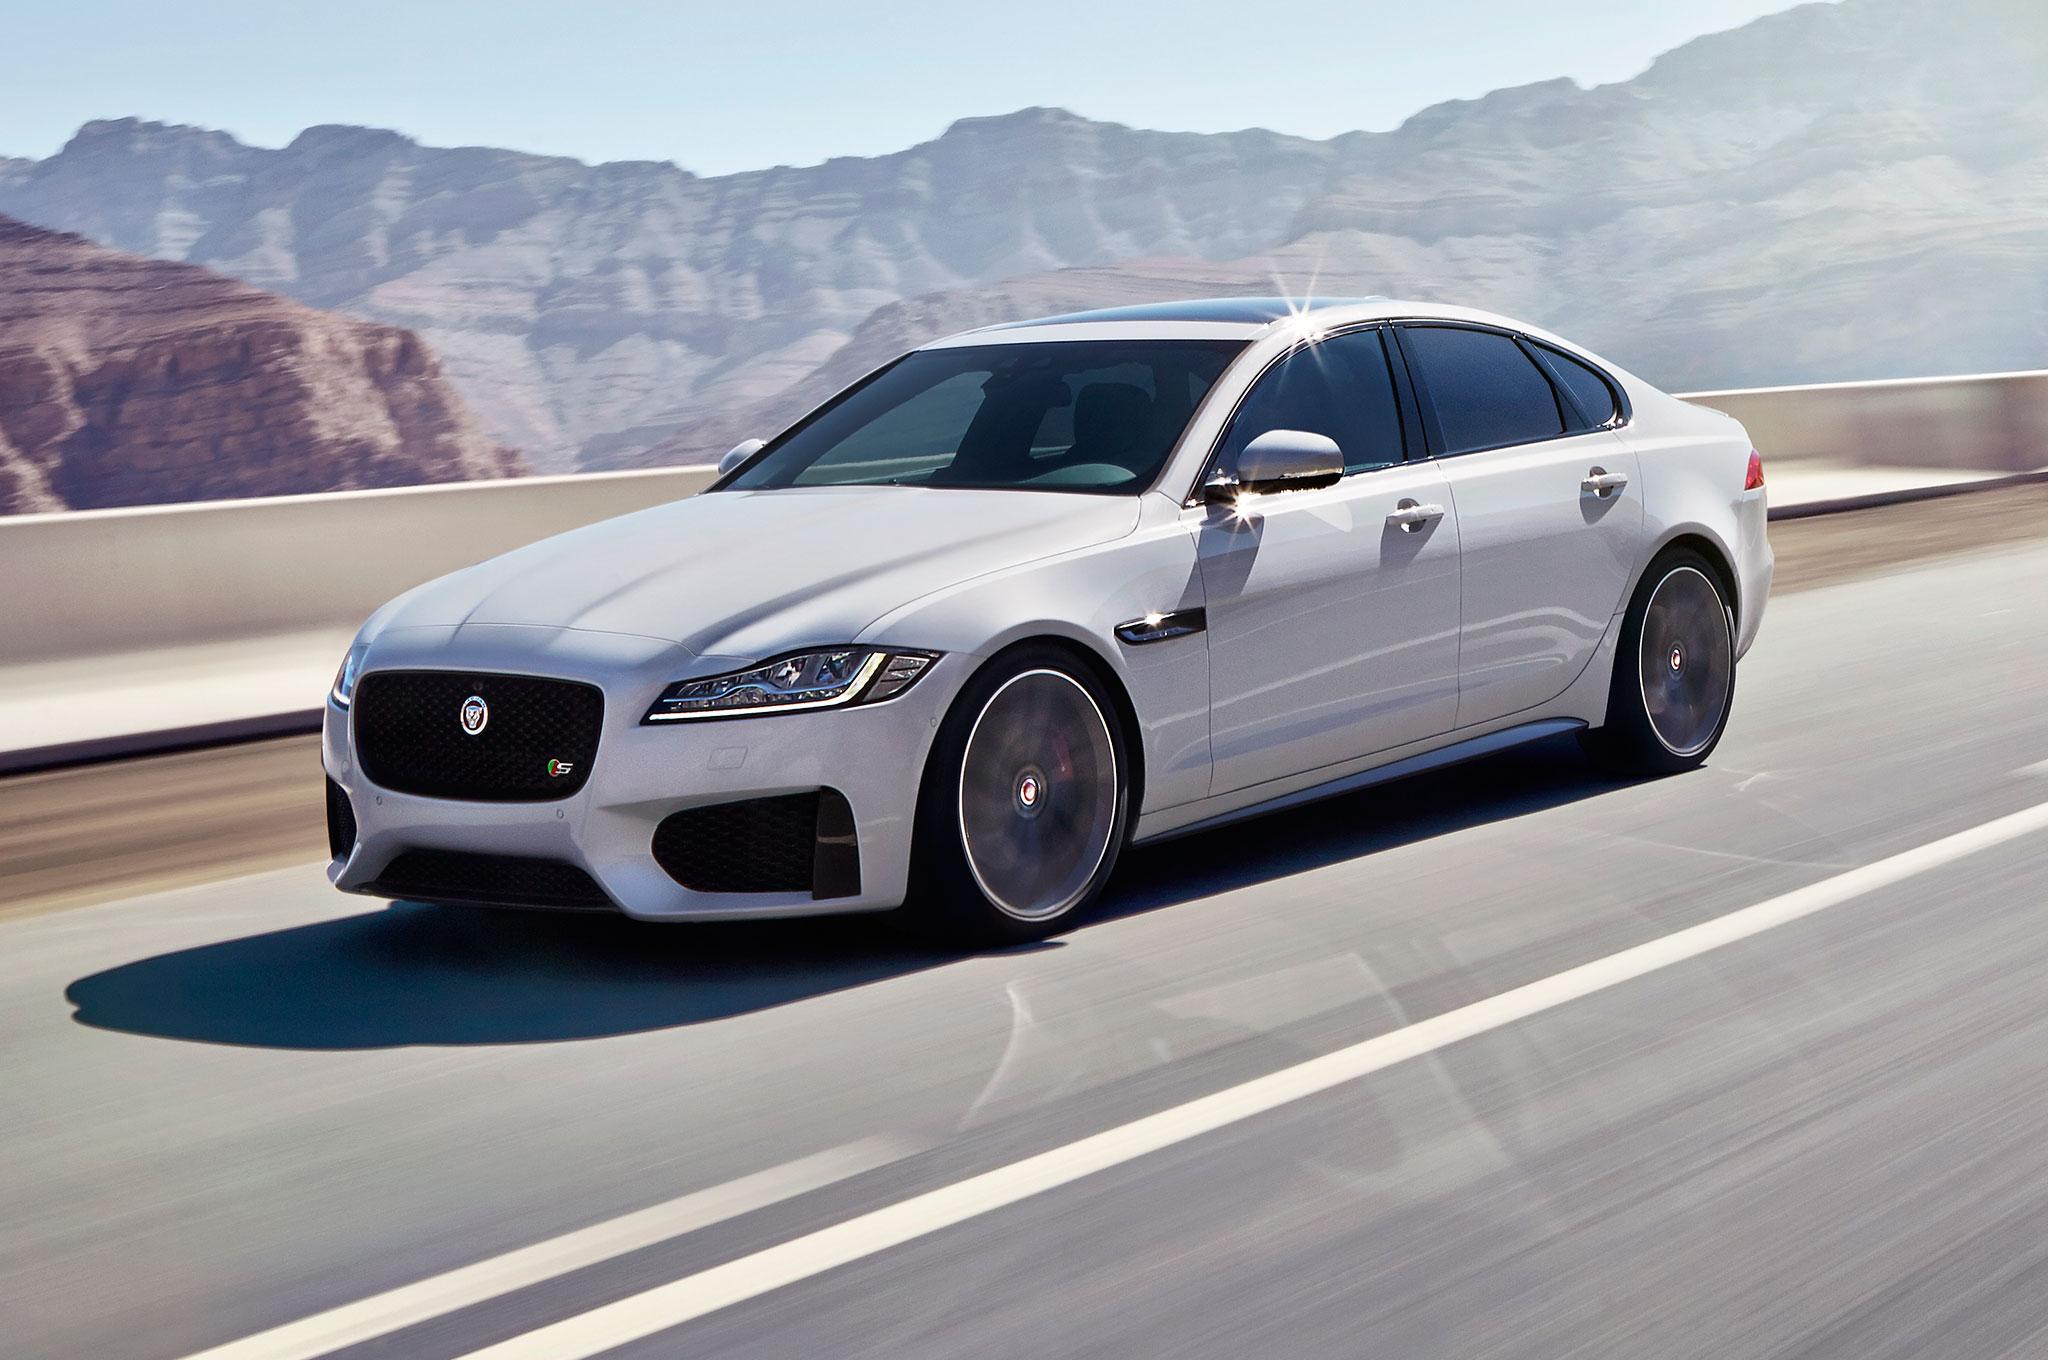 cars picture supercharged door xf aliquippa sale for of williawbbrutlag sedan in jaguar